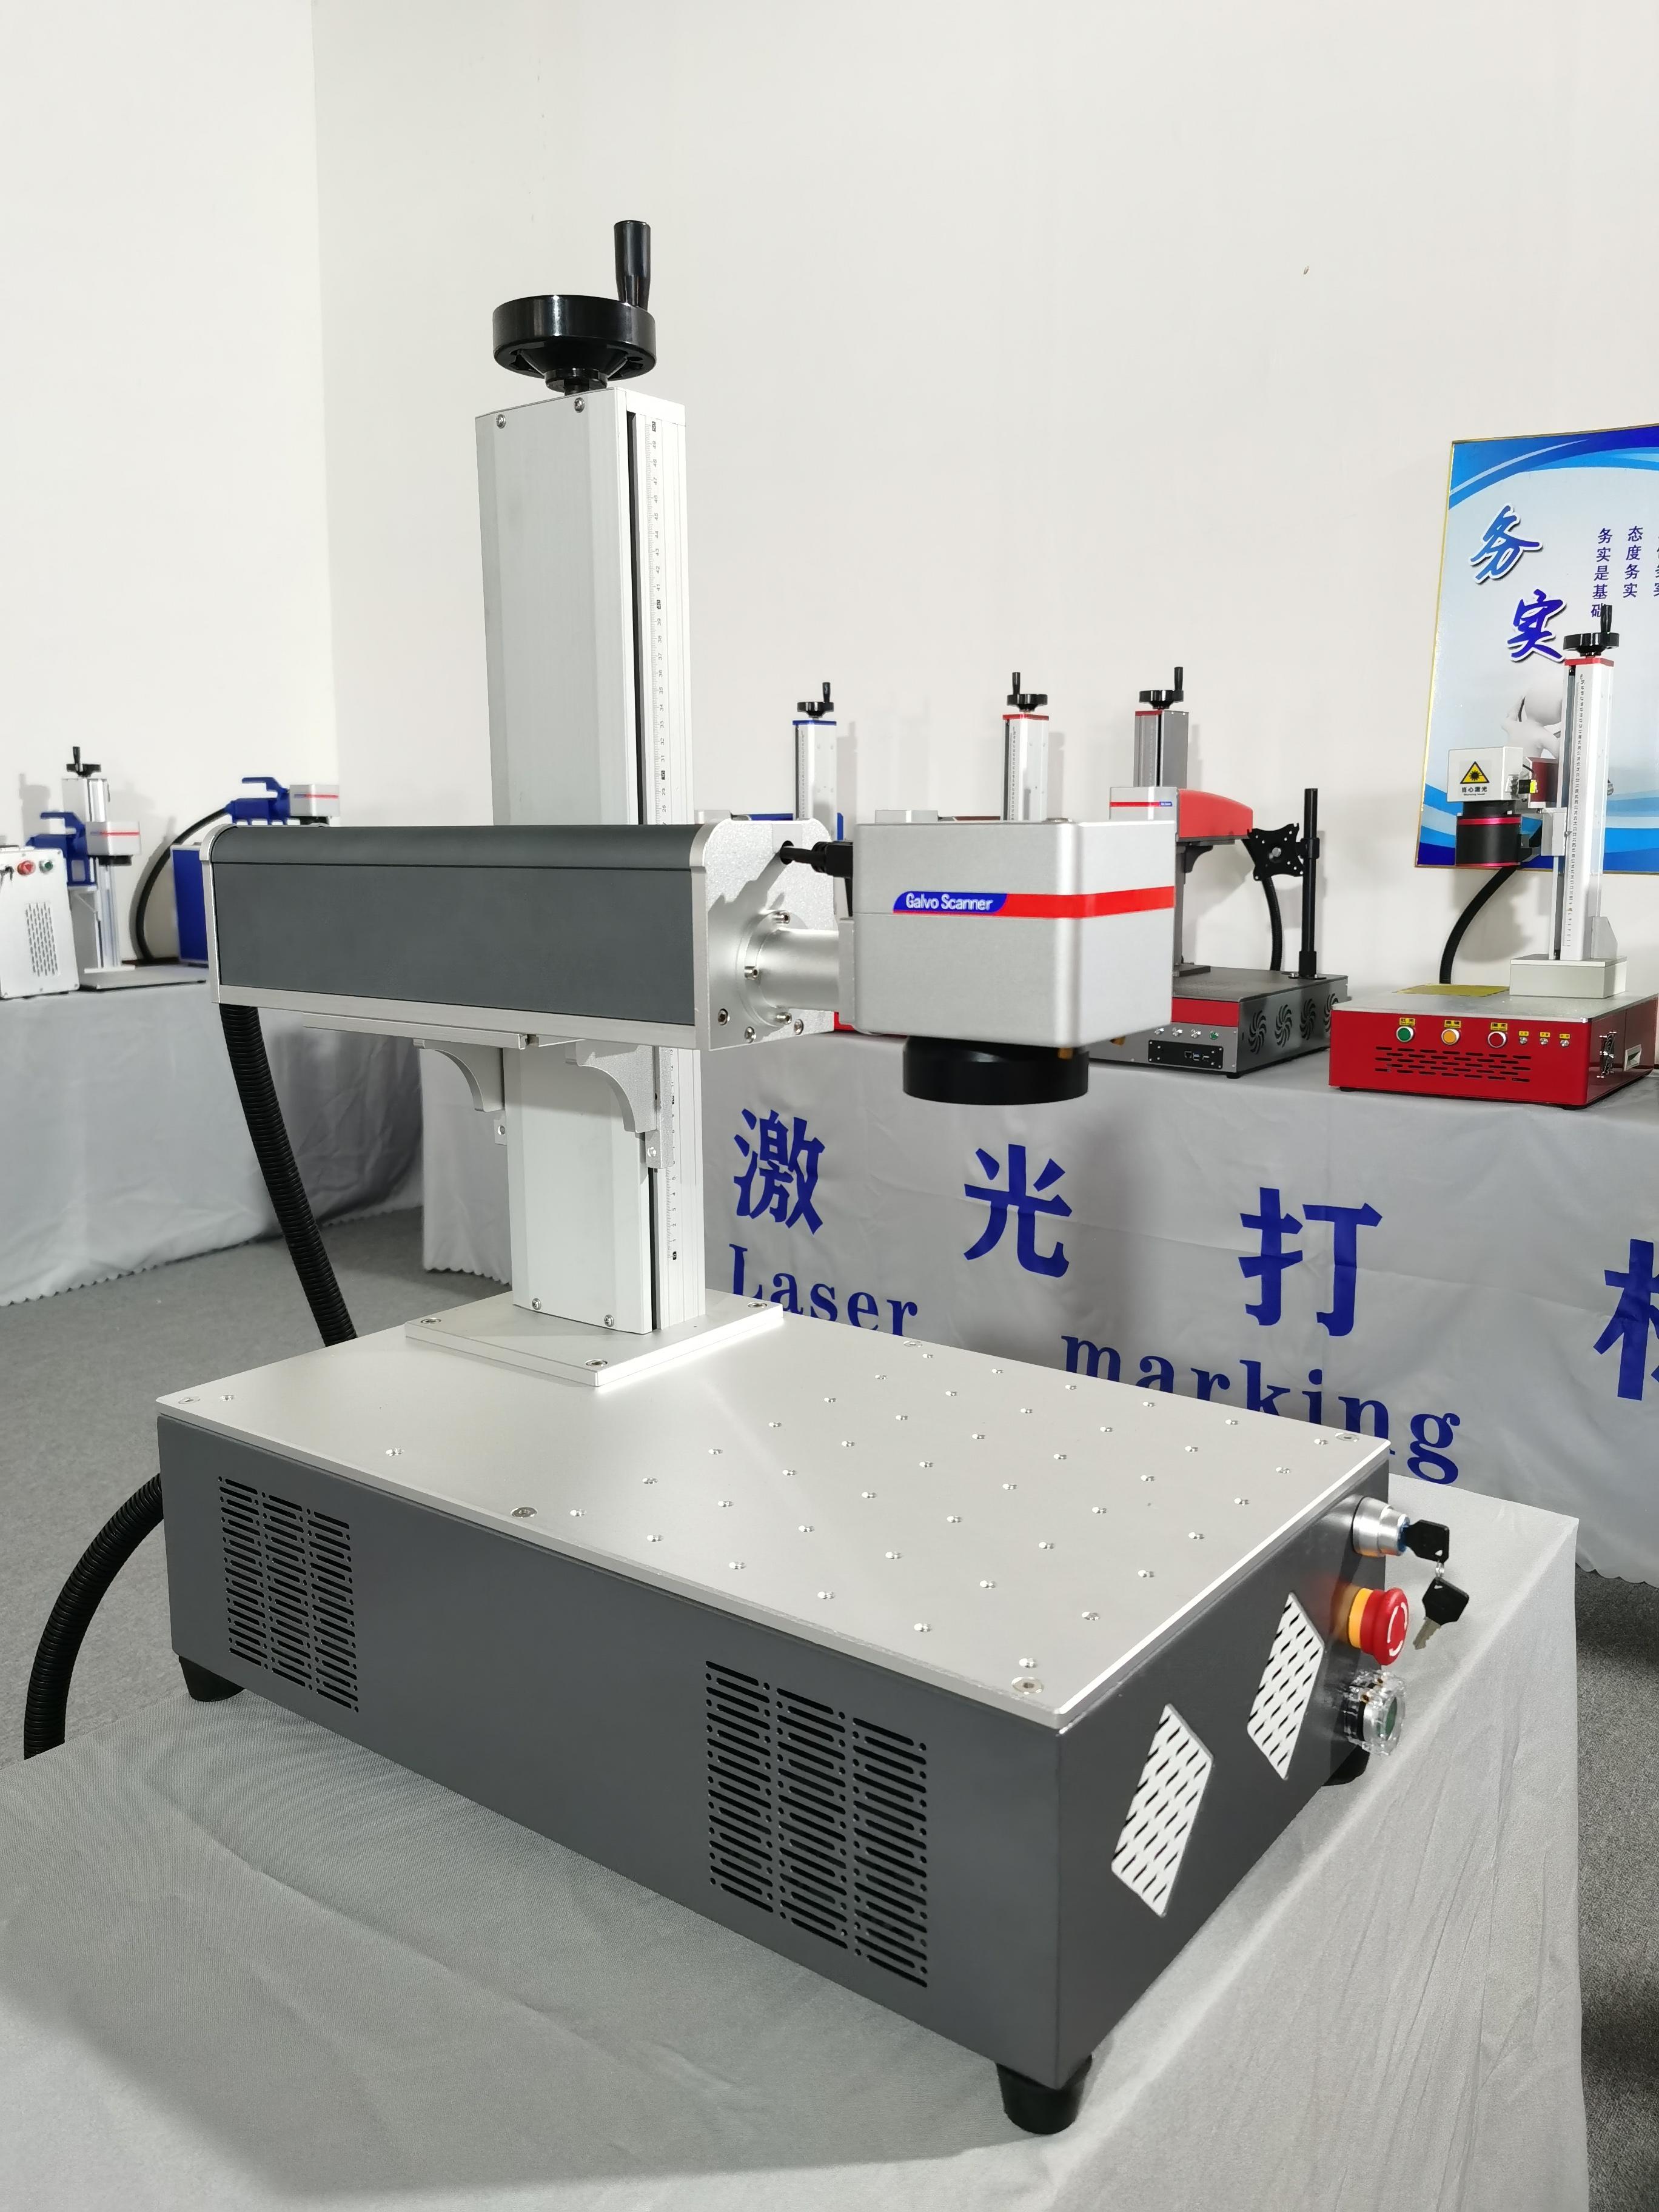 Horizon Laser 50W portable laser marking machine